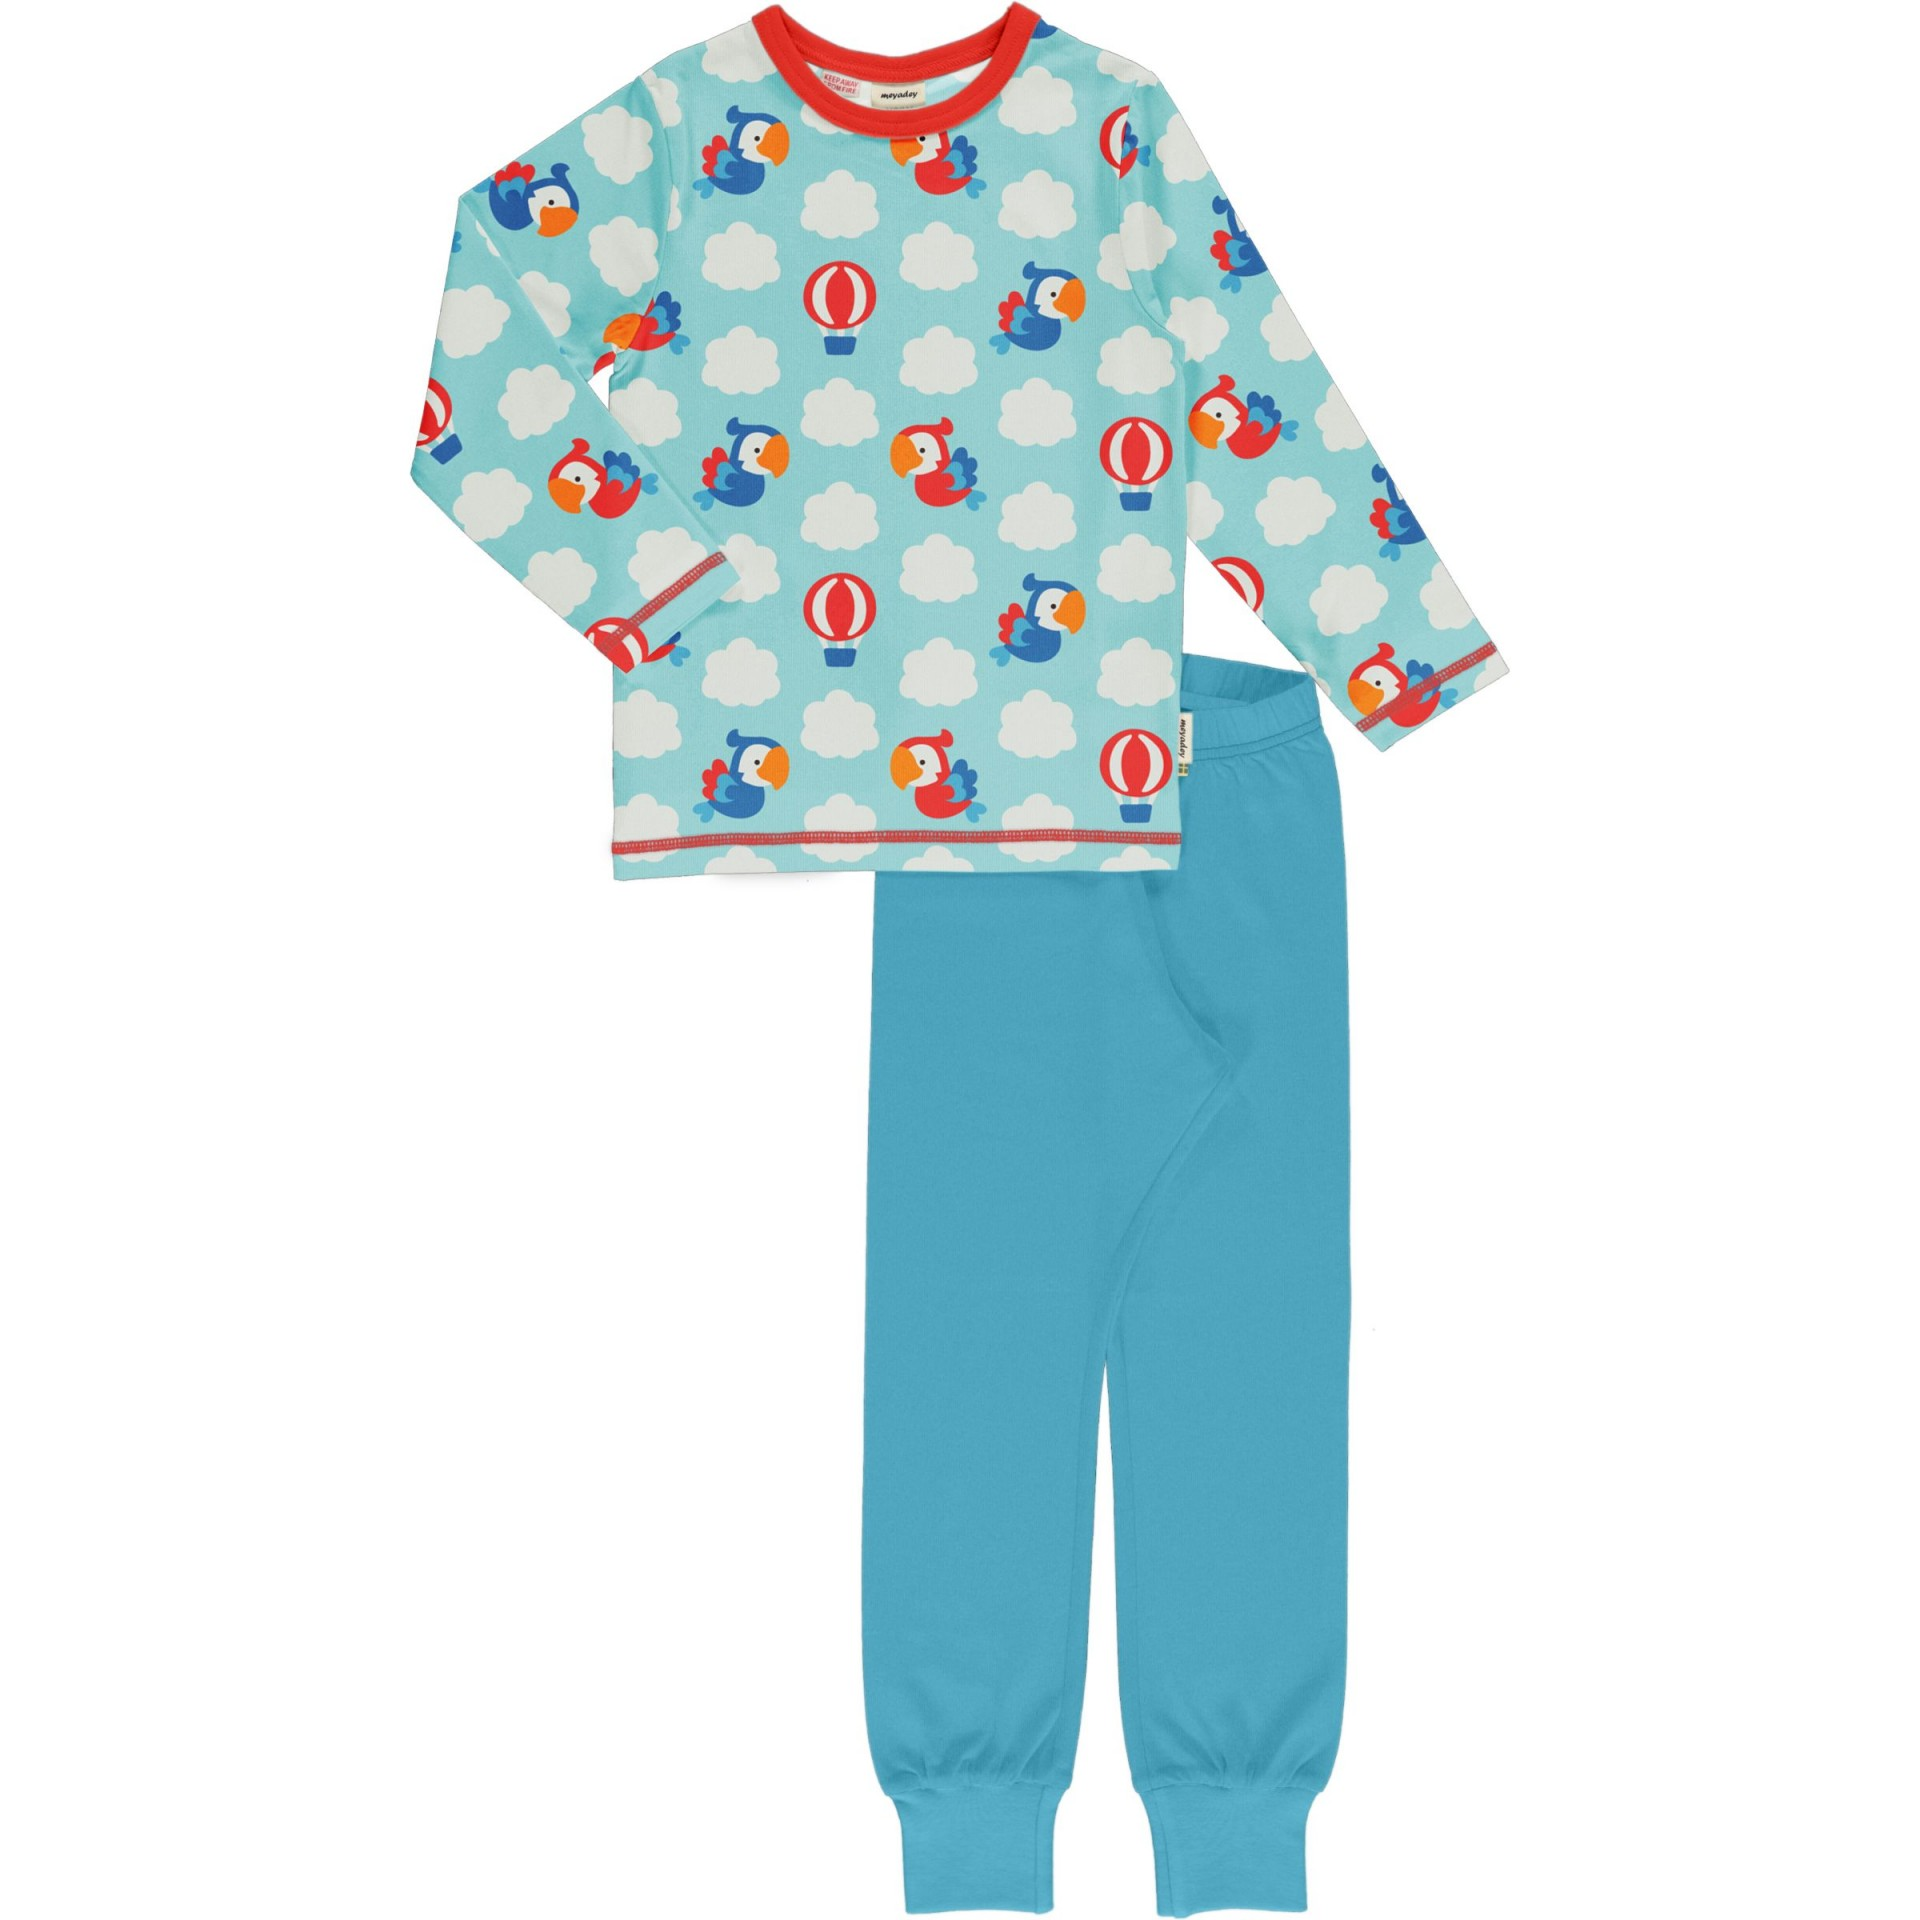 Pijama PARROT SAFARI Maxomorra (Tamanhos disponíveis 18-24m, 3-4a, 7-8a)